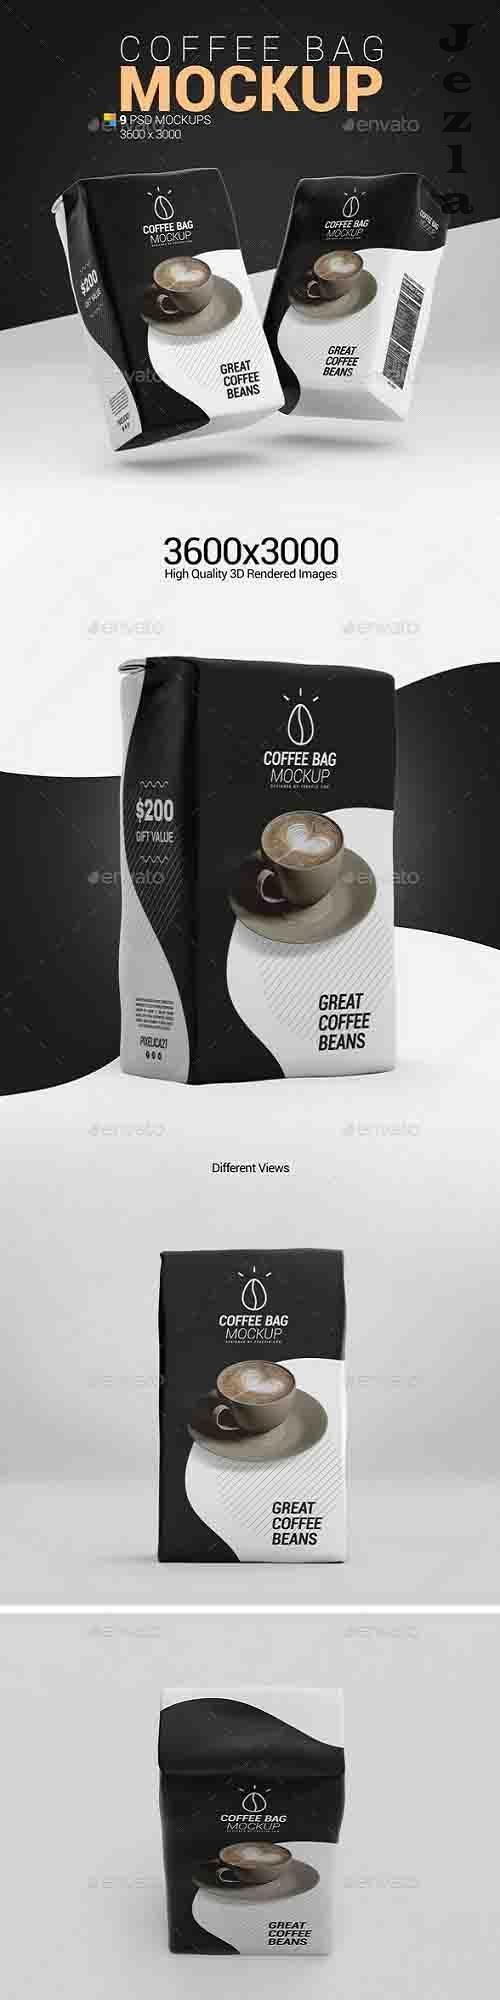 Coffee Paper Bag Mockup 26114957